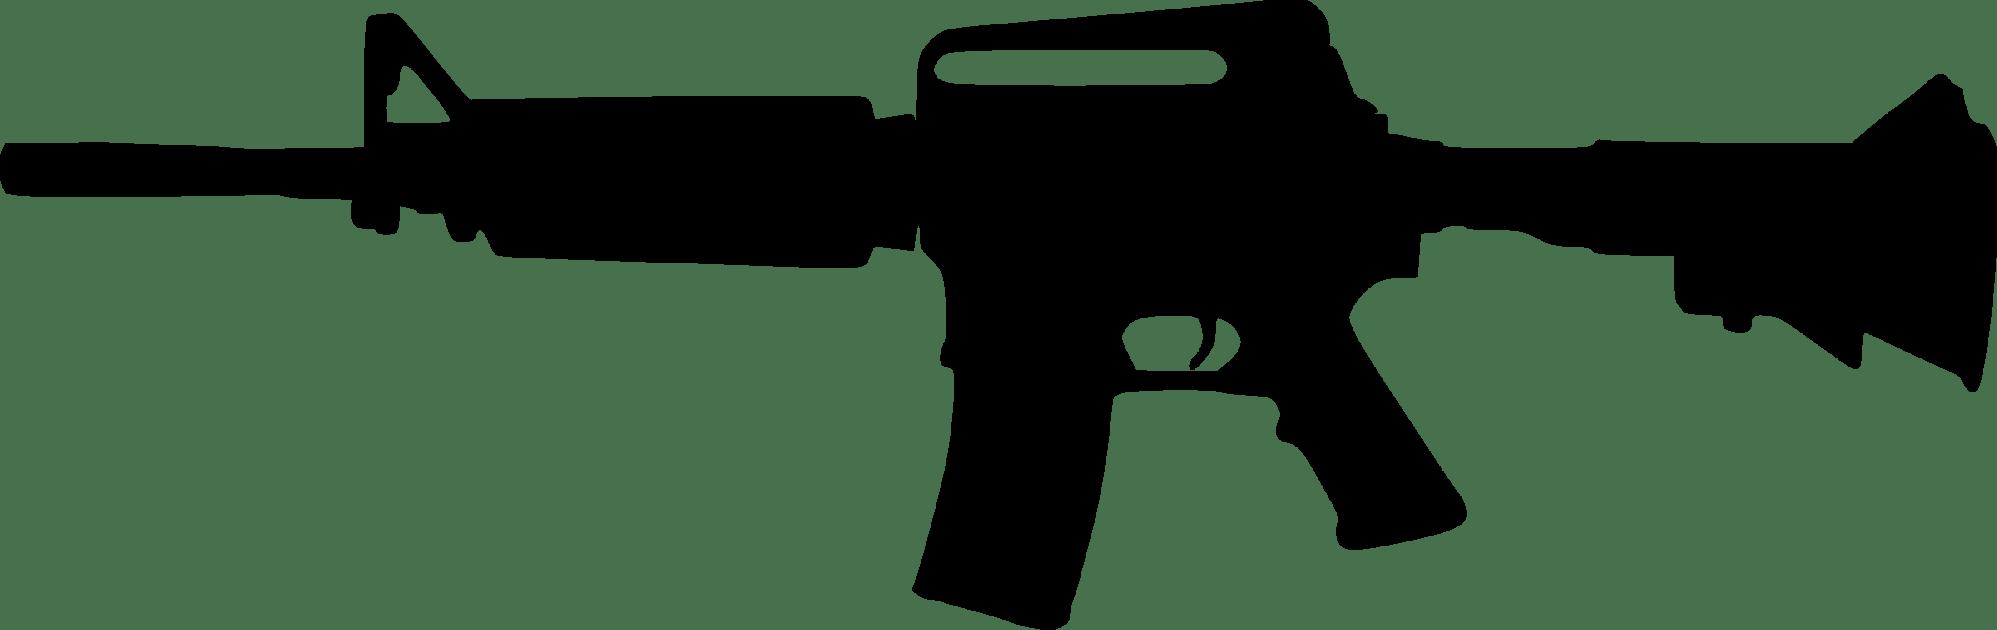 hight resolution of 2400x757 assault rifle clipart custom